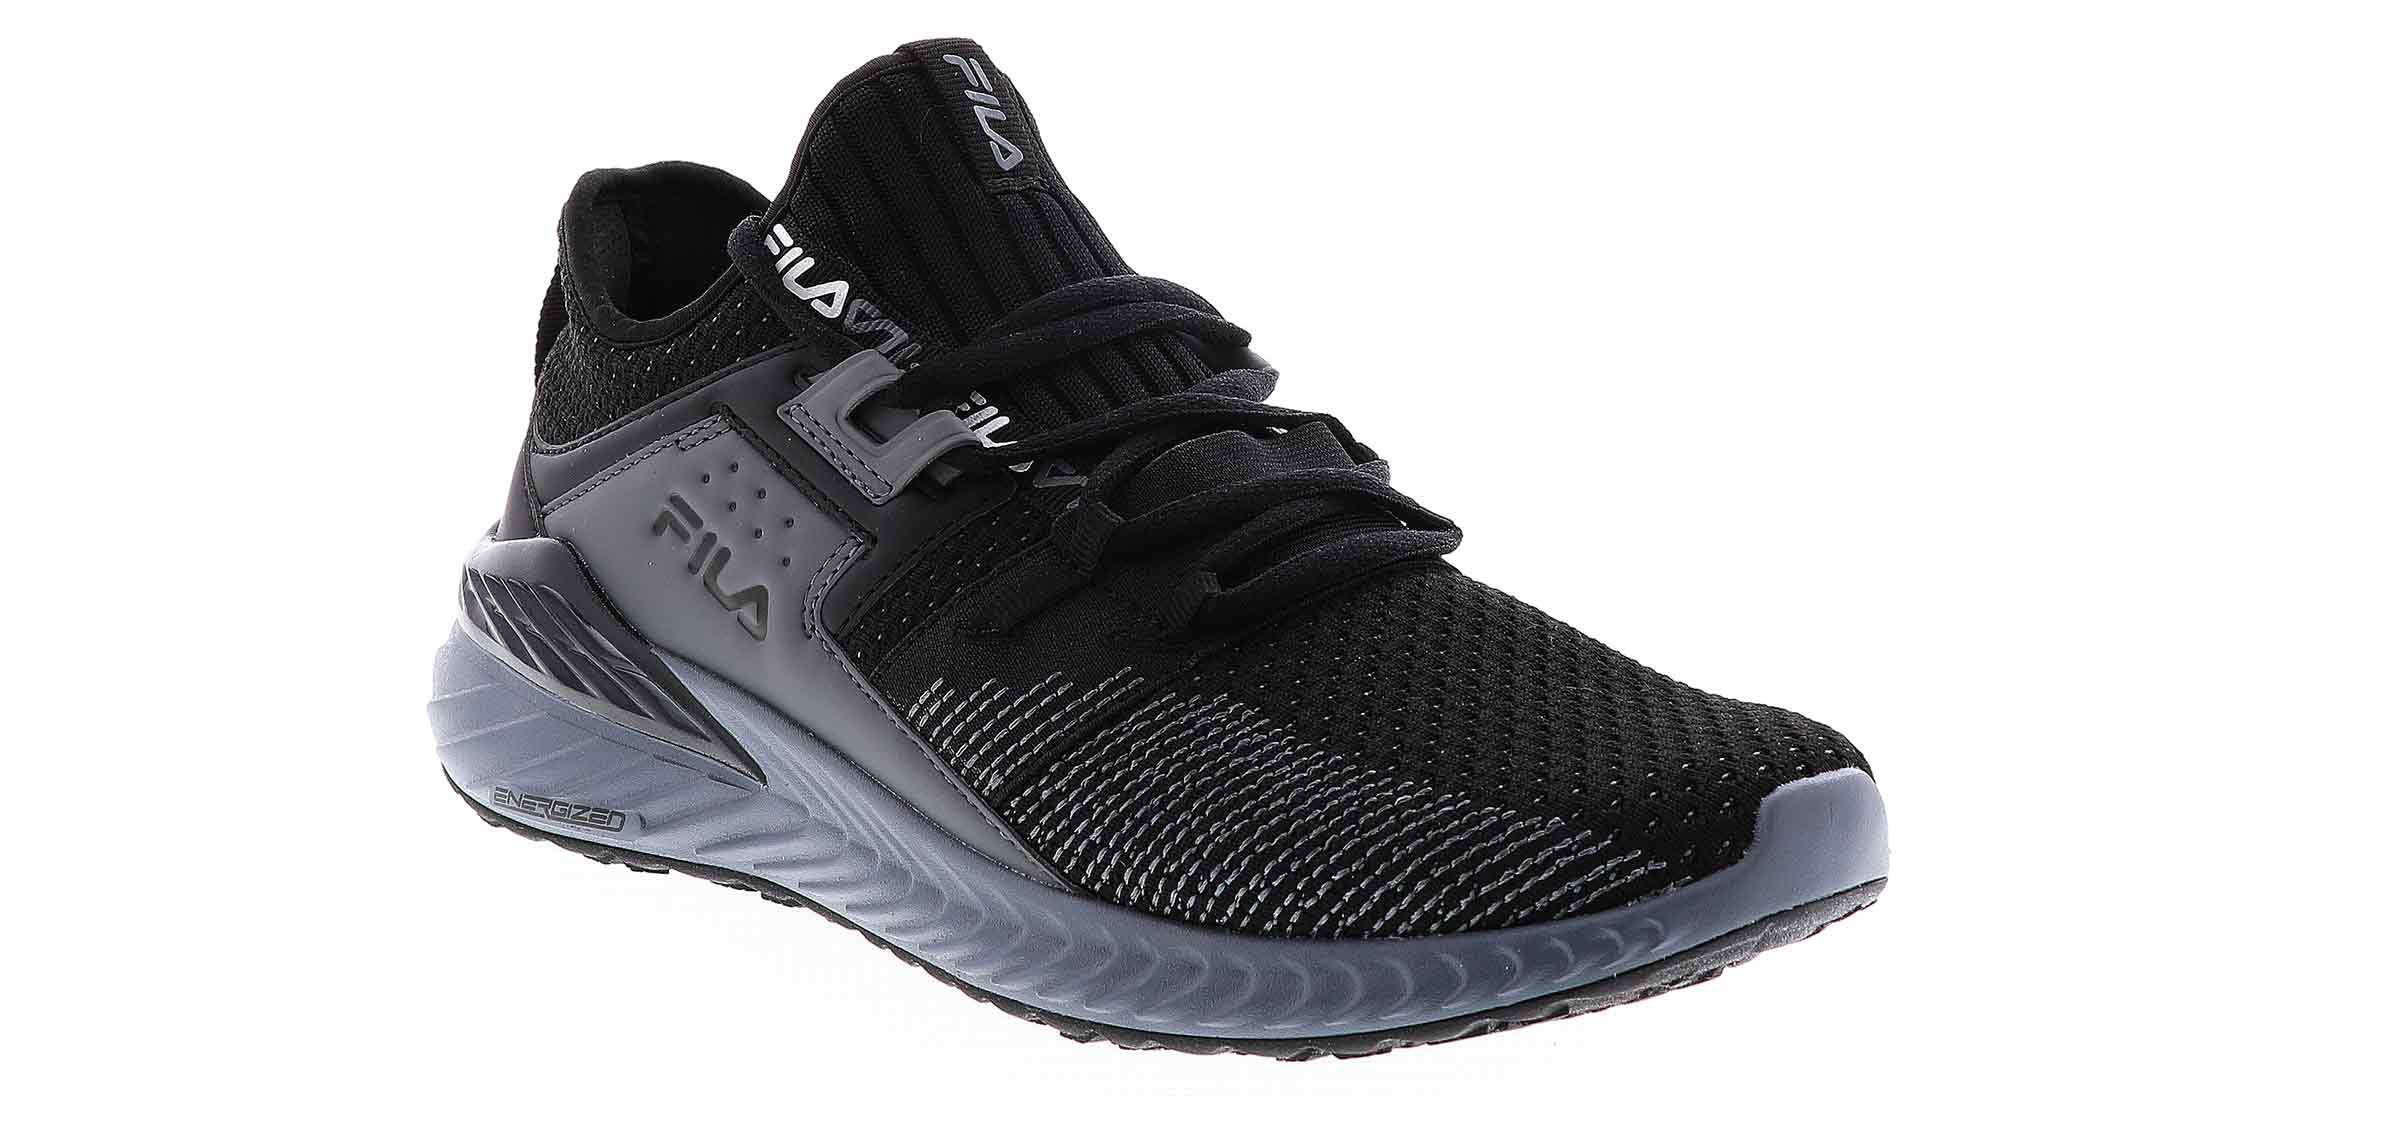 men's realmspeed 20 energized mens running shoe